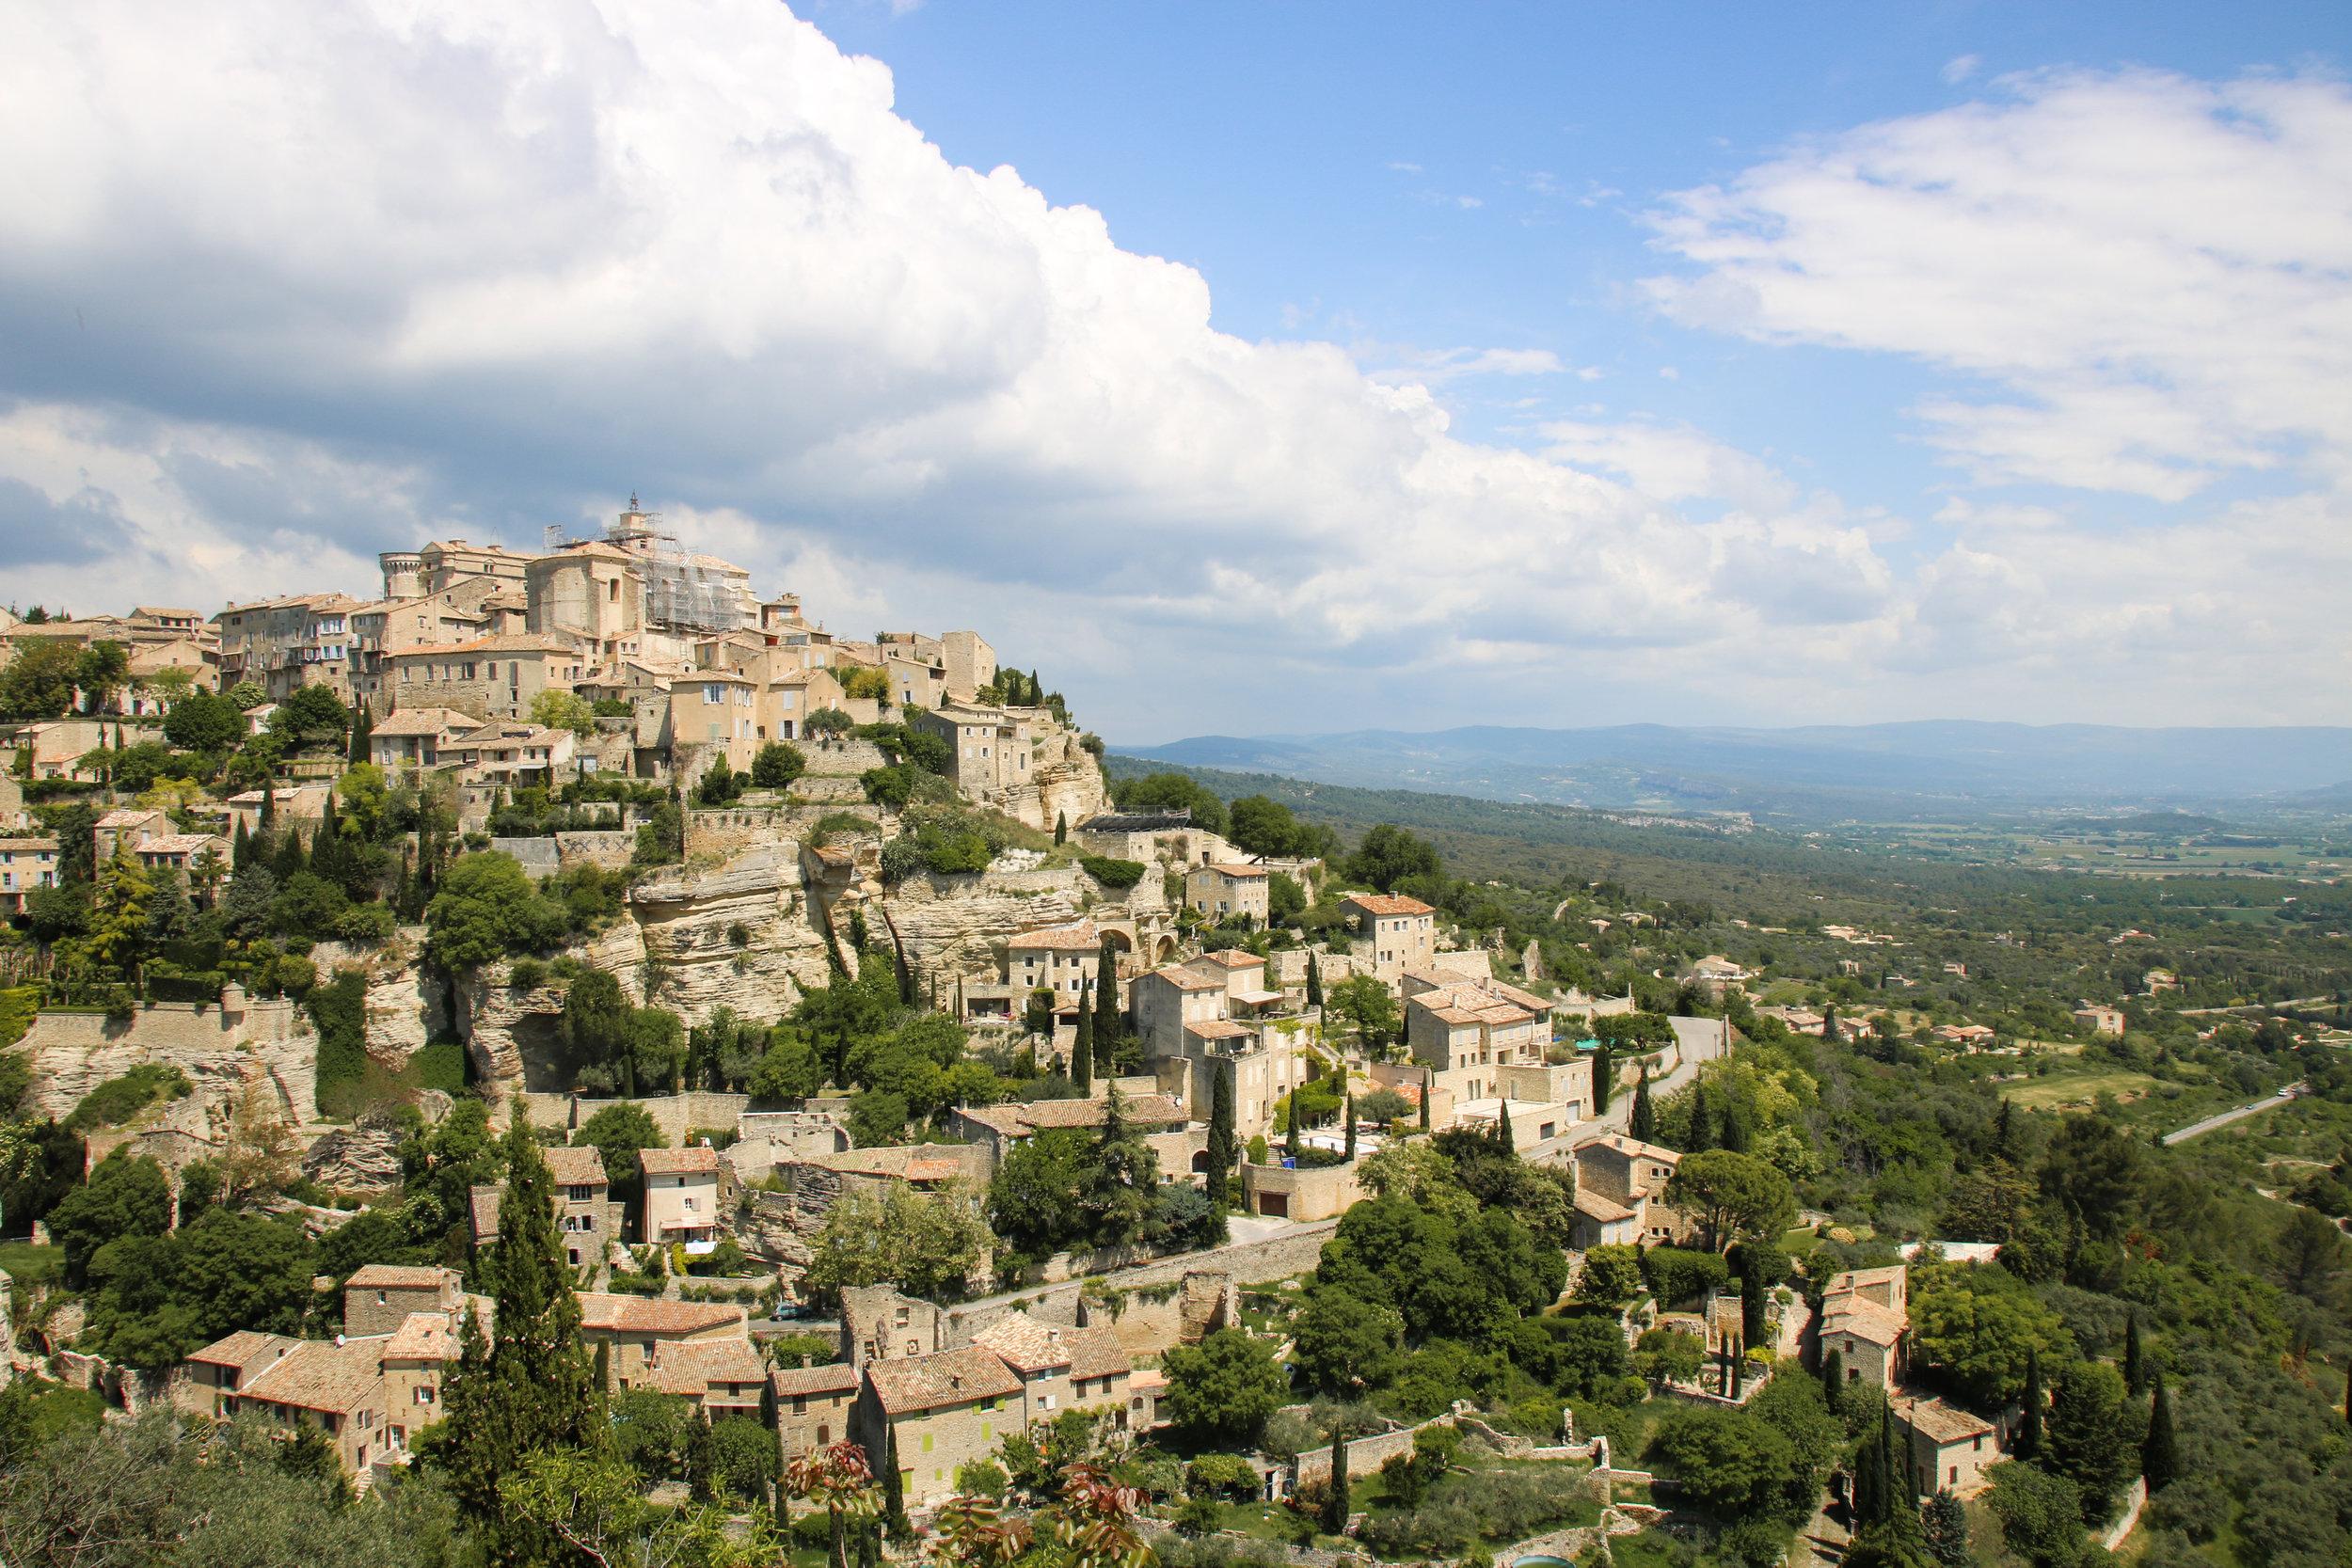 Gordes. Where to visit in the Luberon. Across Land & Sea